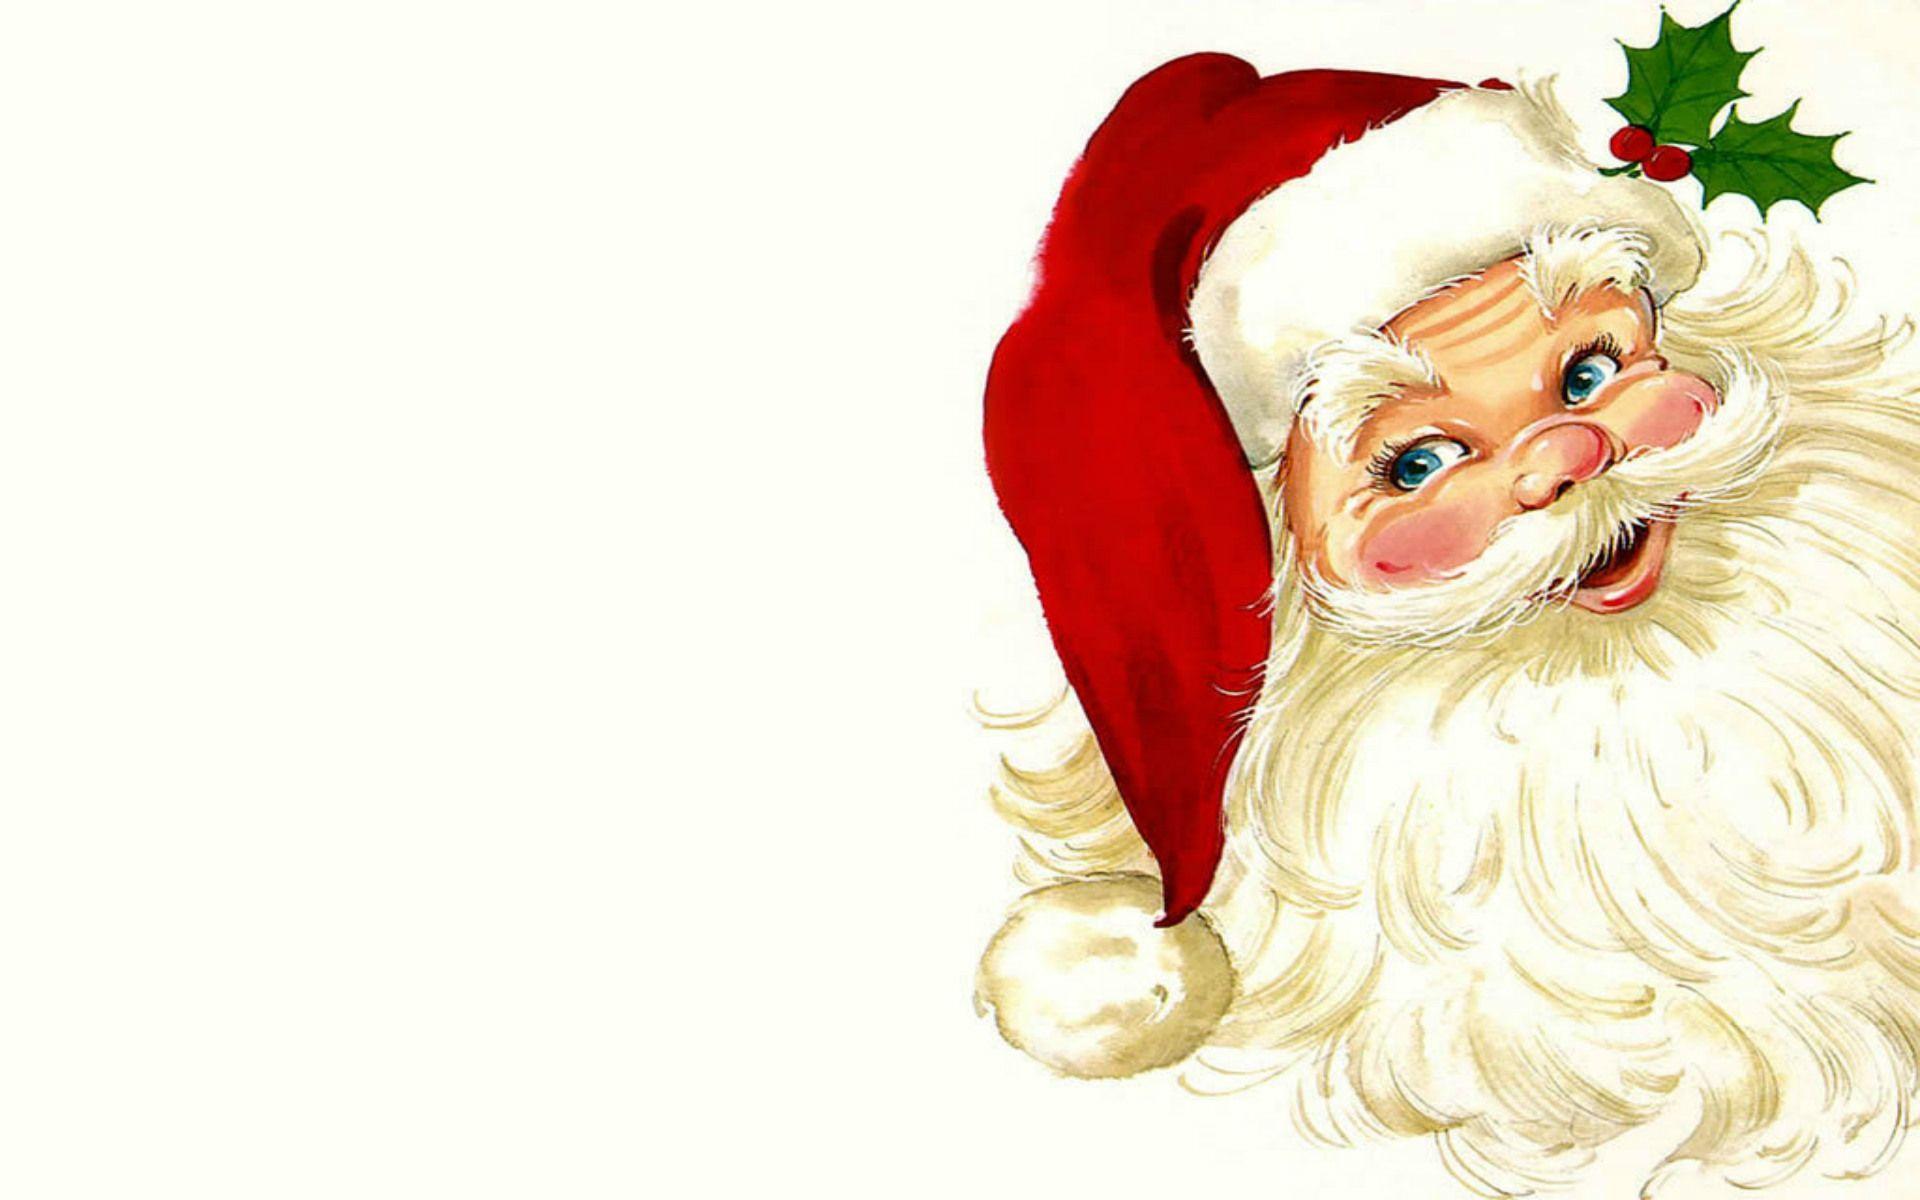 Santa Claus 2017 Wallpapers - Wallpaper Cave